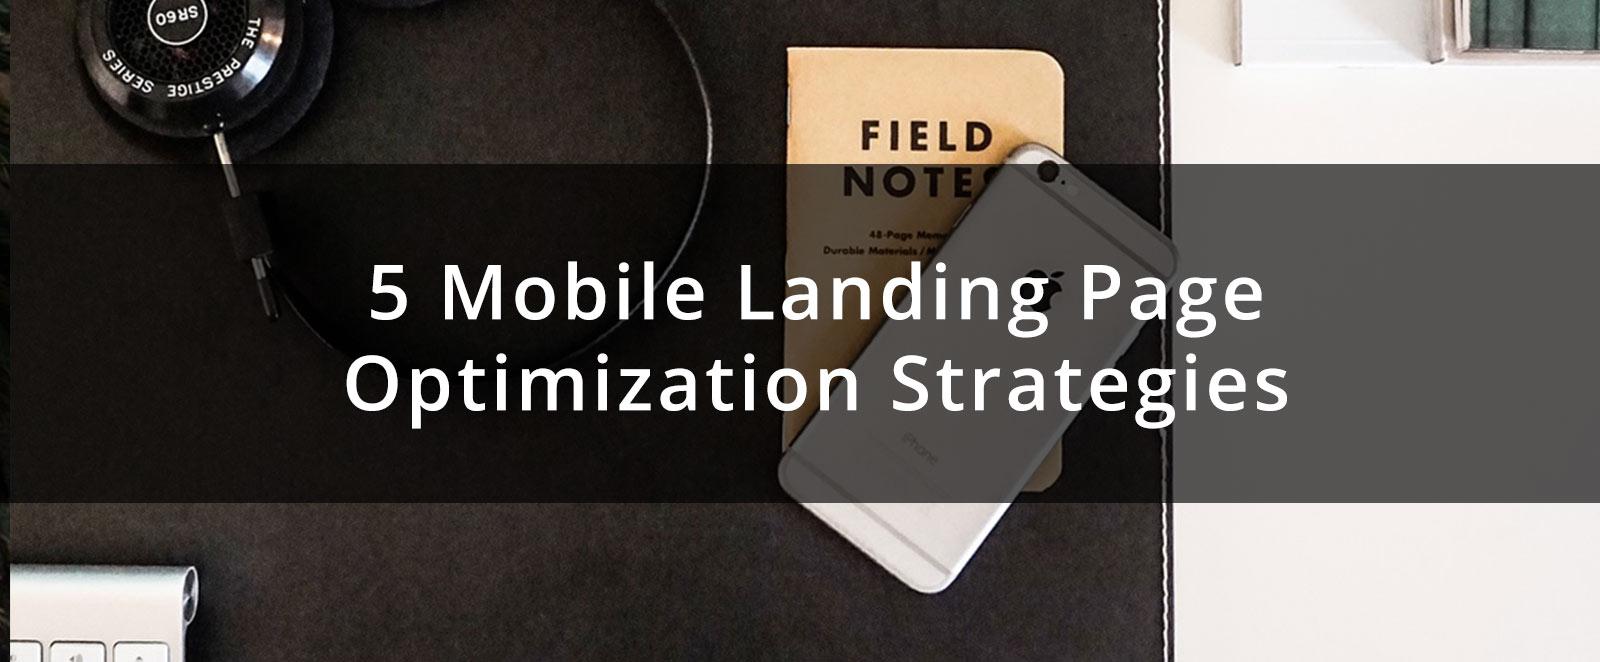 5 Mobile Landing Page Optimization Strategies